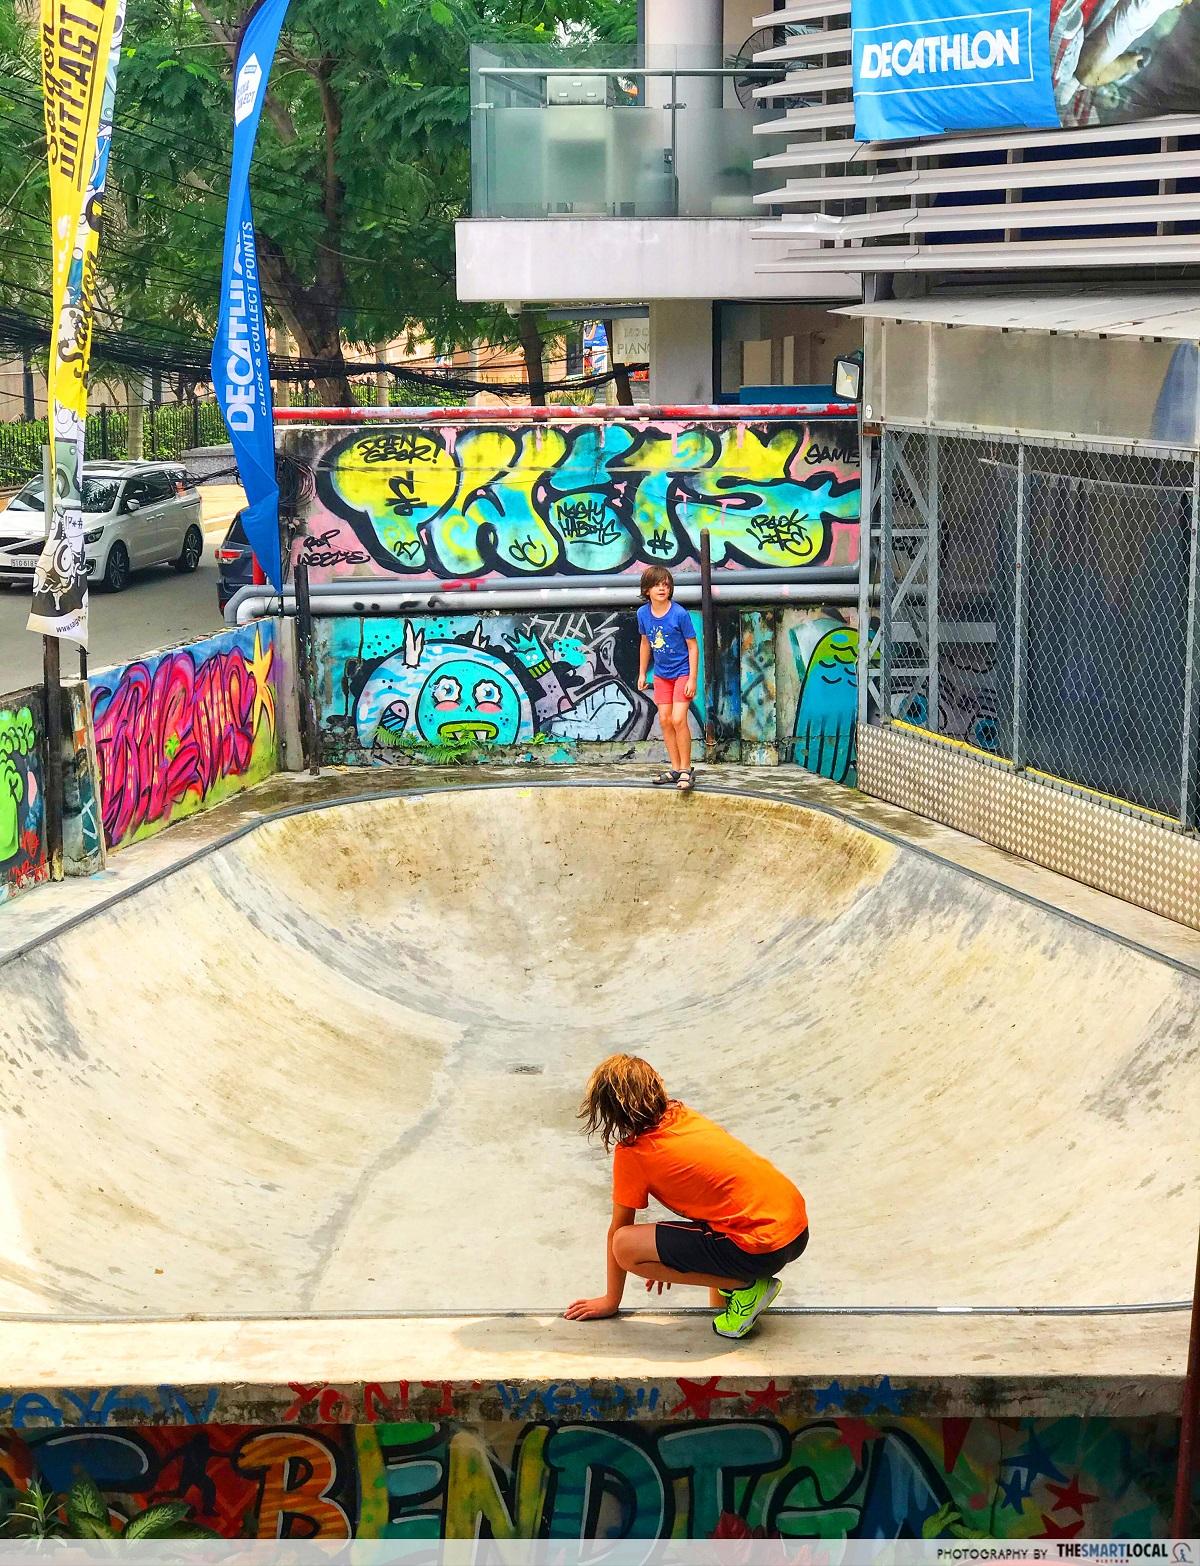 saigon outcast - skating bowl